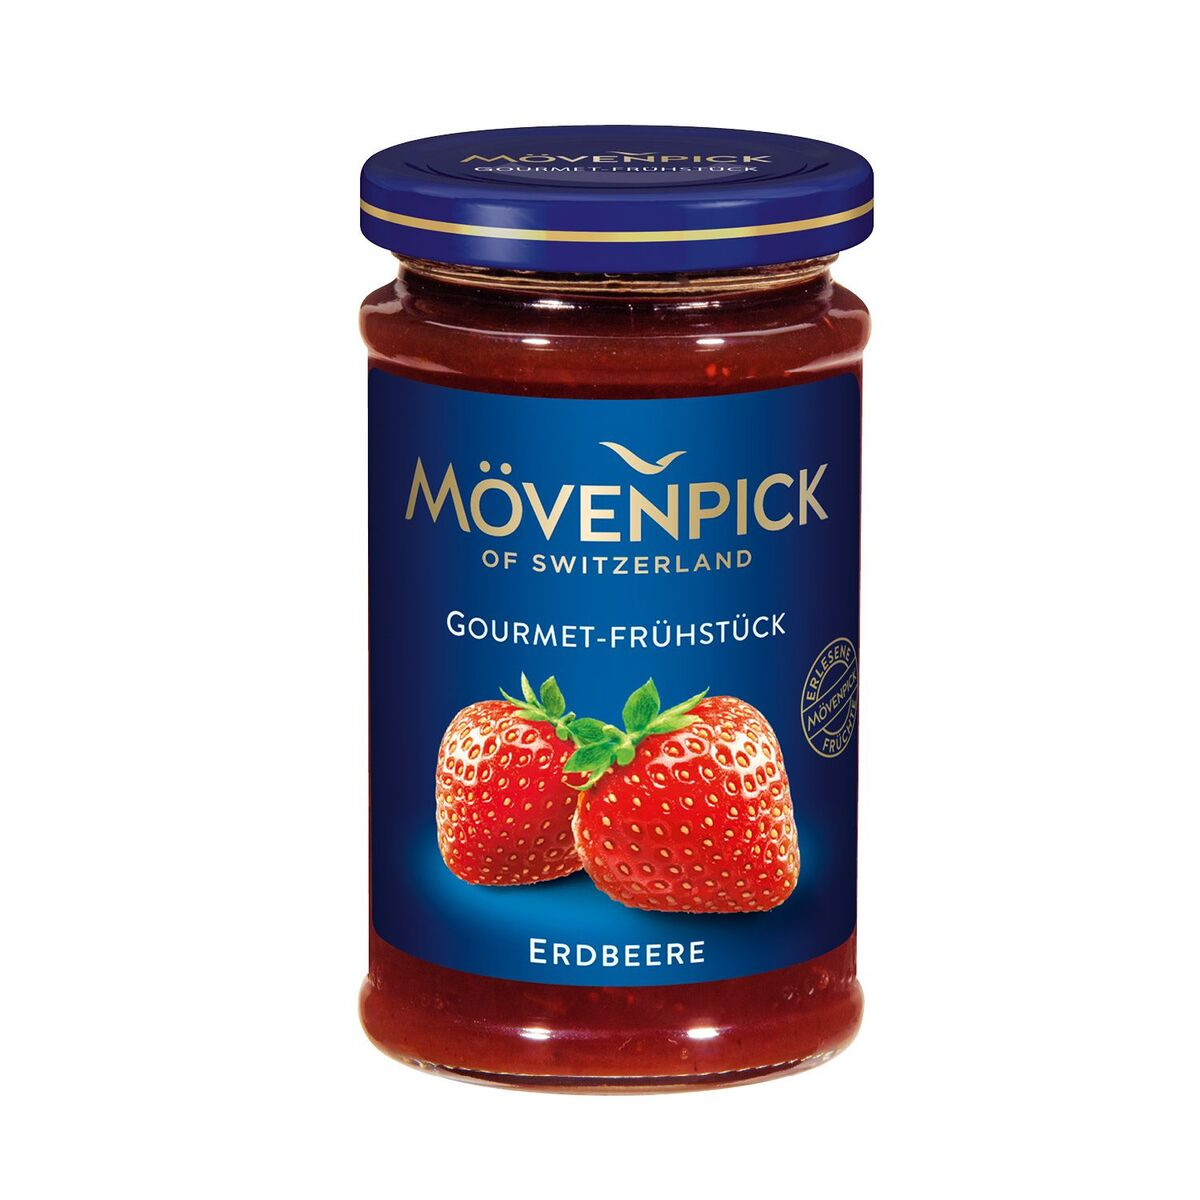 Bild 2 von Mövenpick®  Gourmet Frühstück 250 g